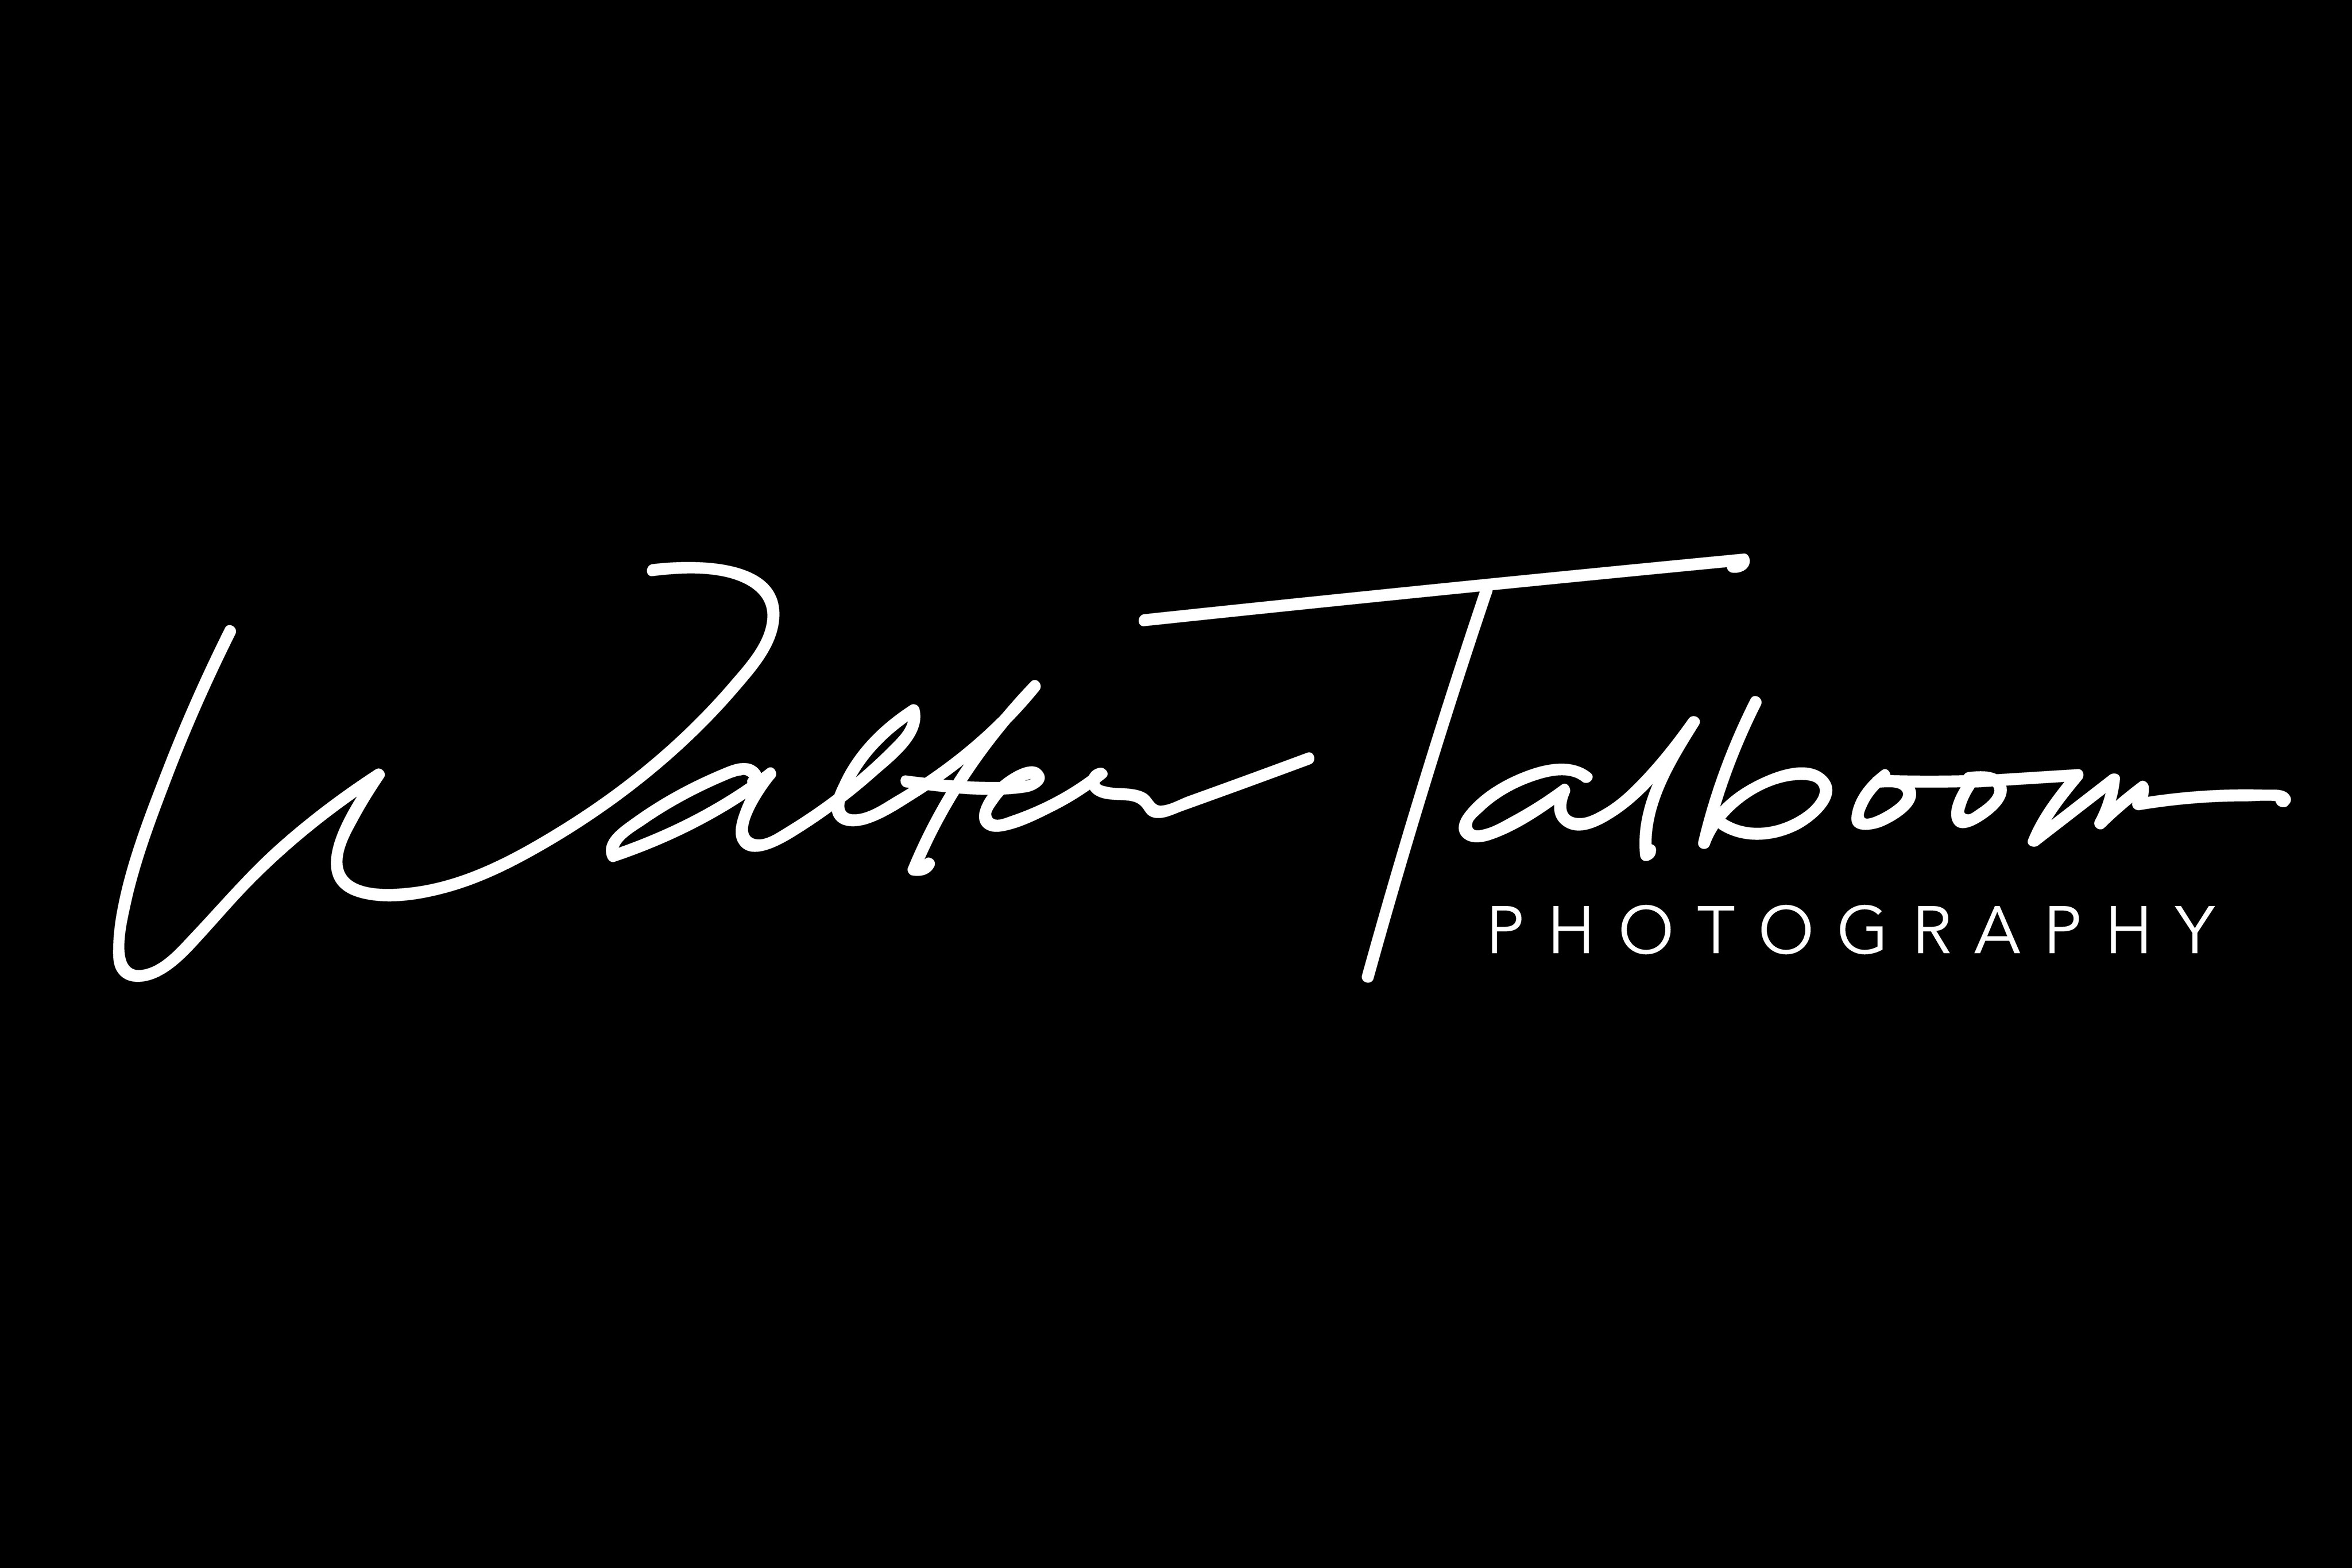 Walter Talboom